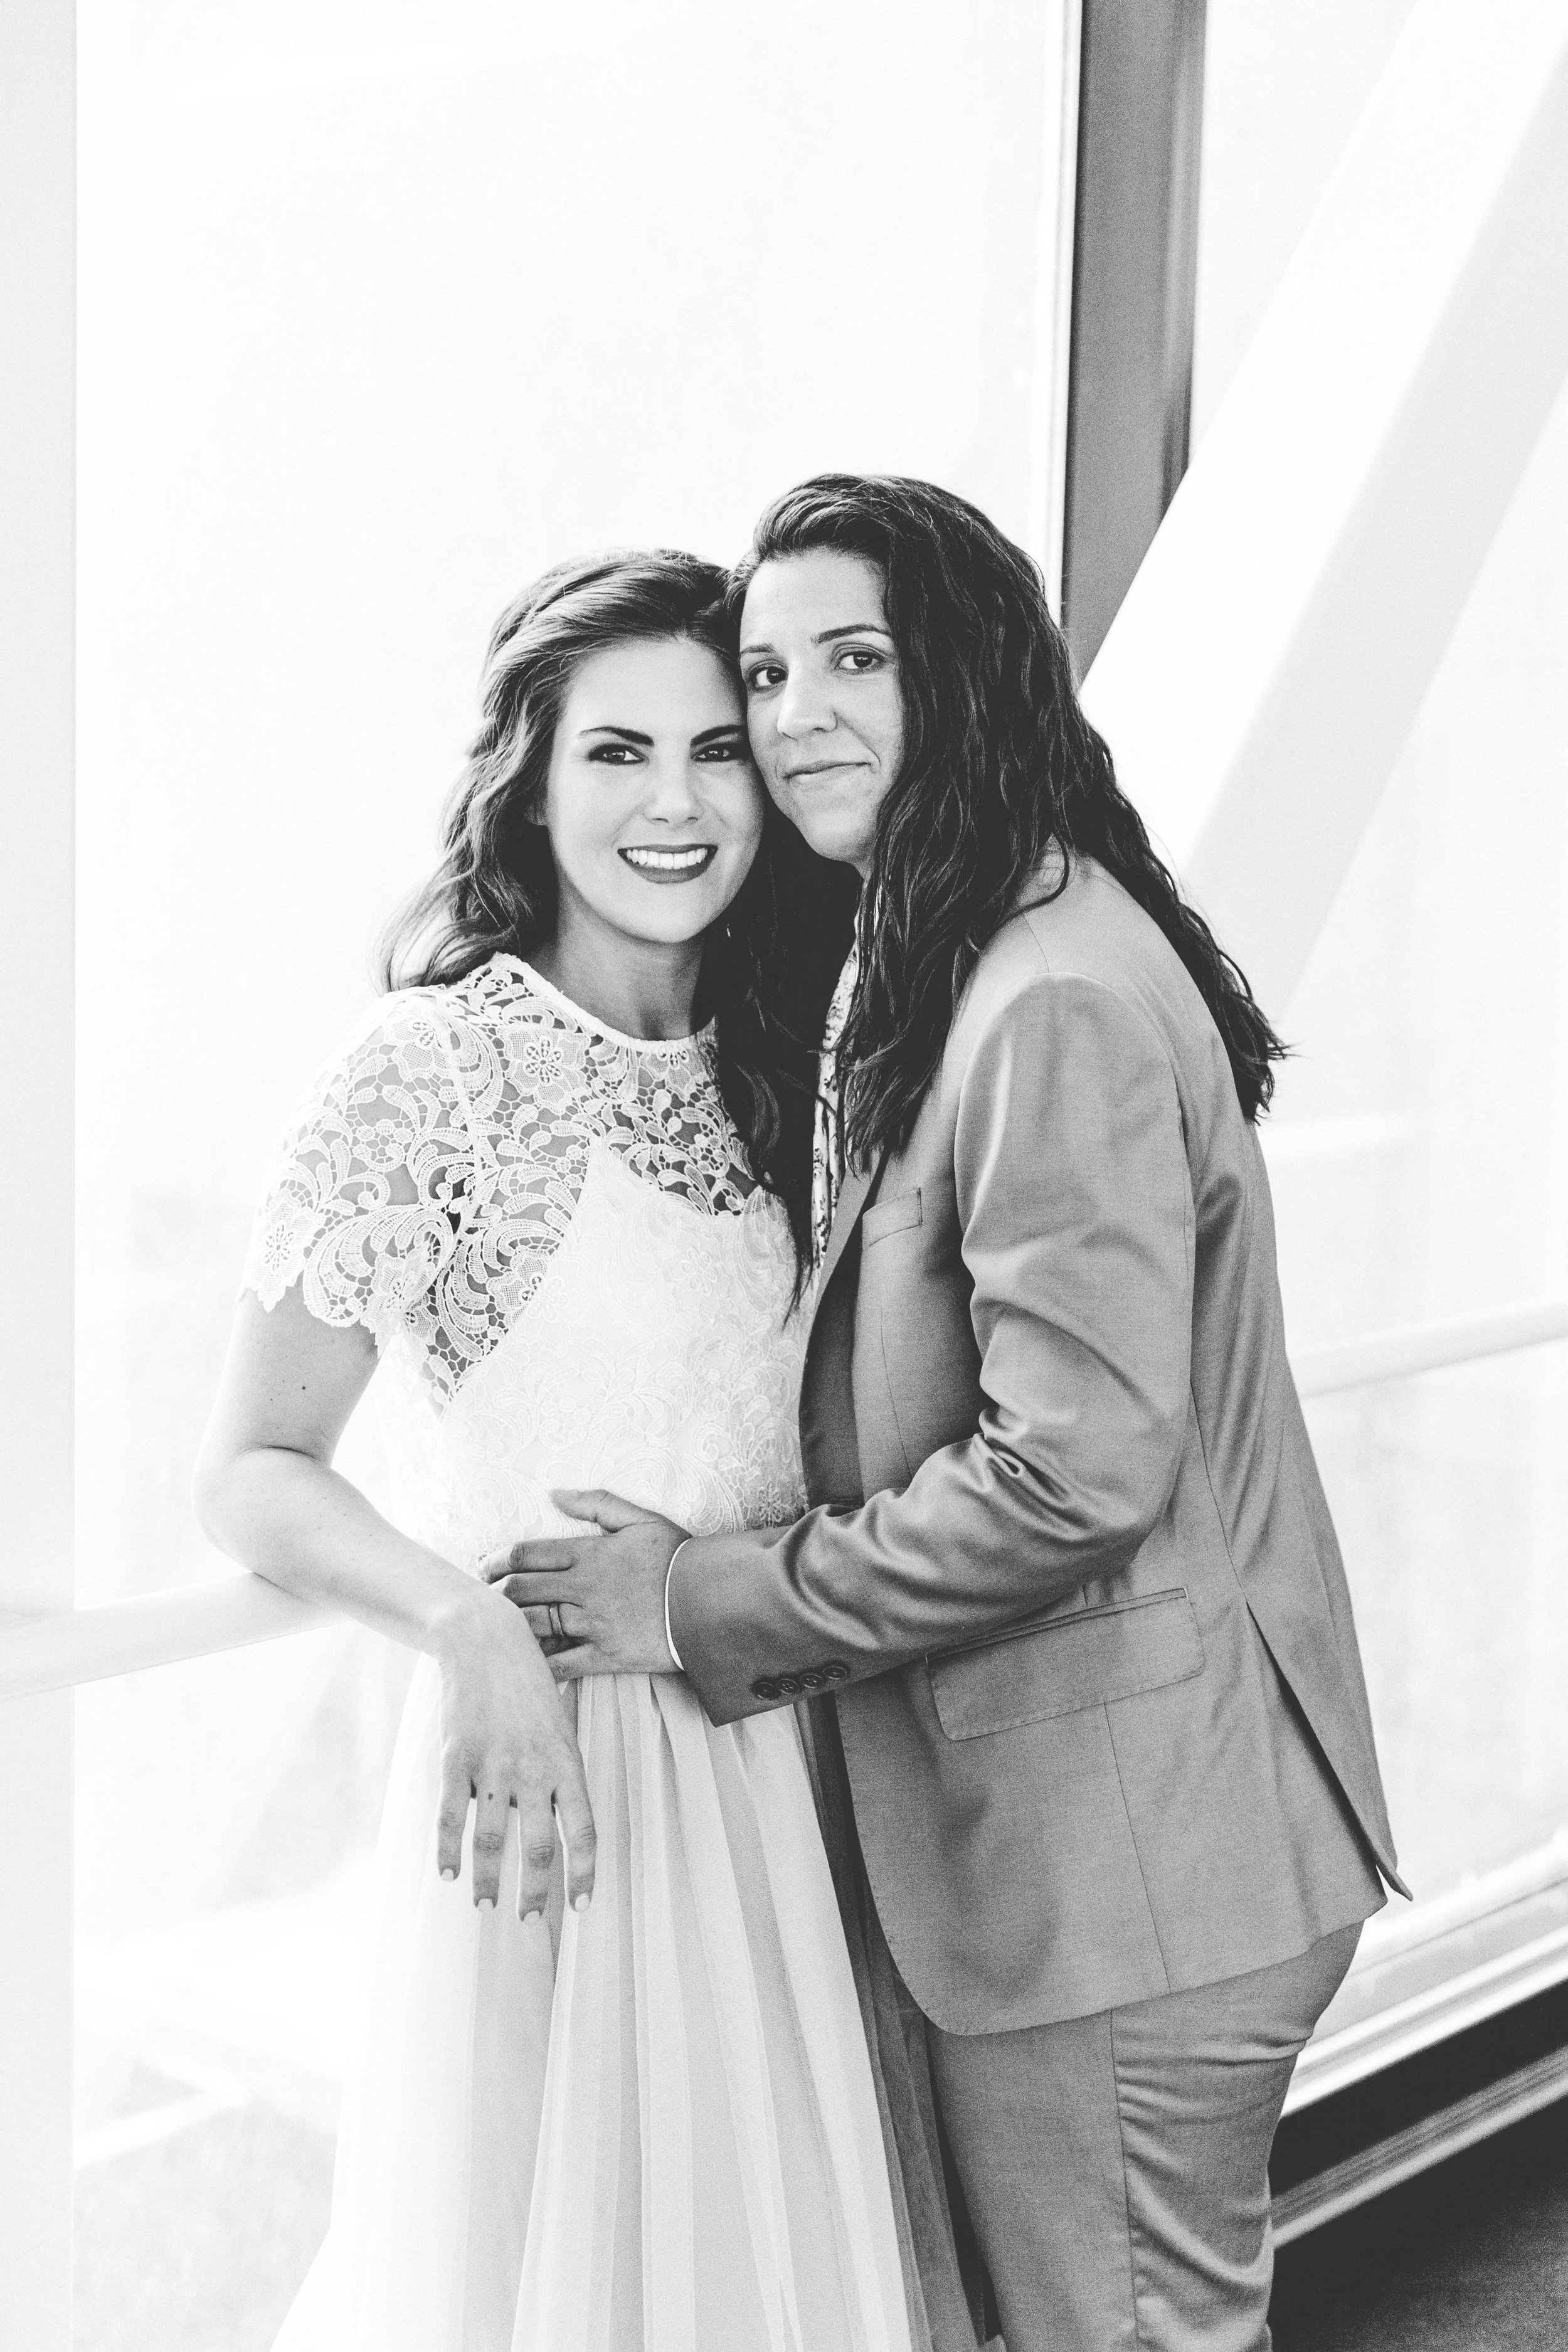 cnp2018-Morgan&Natalie-0010_bw.jpg